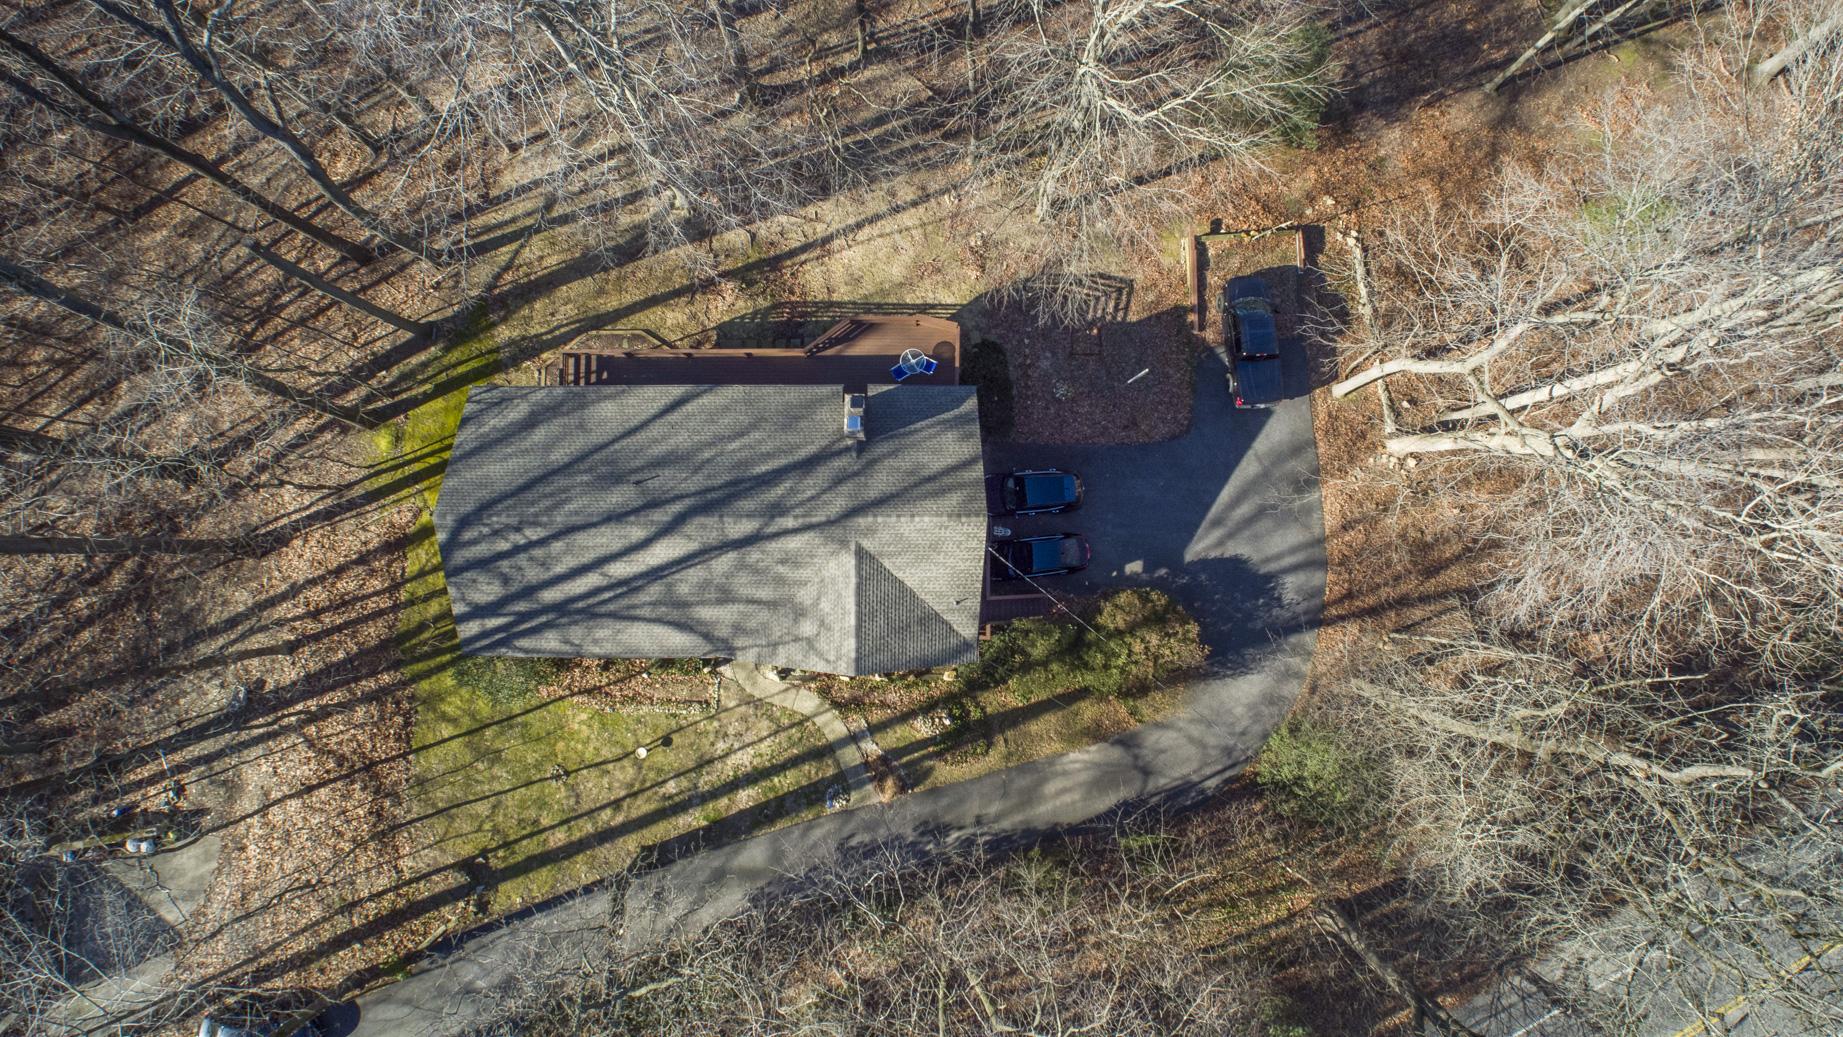 183 Palmers Mill Rd (Drone)18.jpg